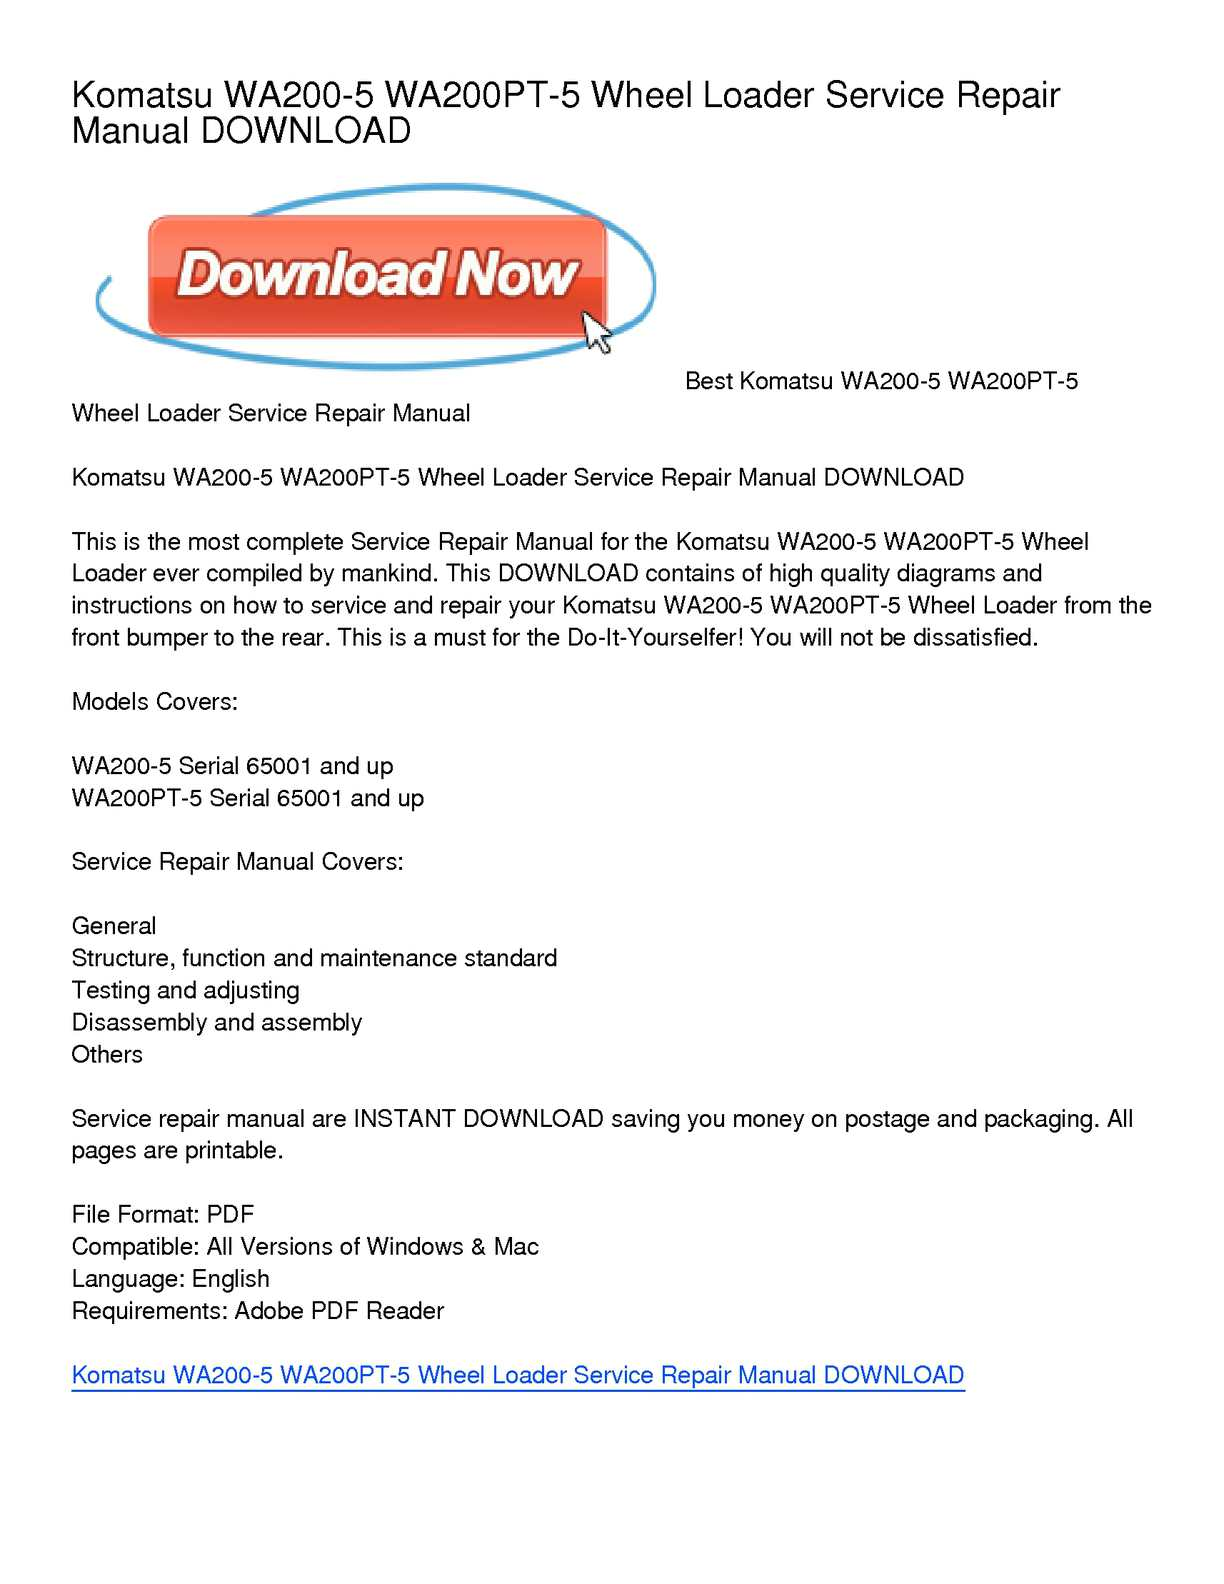 Calaméo - Komatsu WA200-5 WA200PT-5 Wheel Loader Service Repair Manual  DOWNLOAD